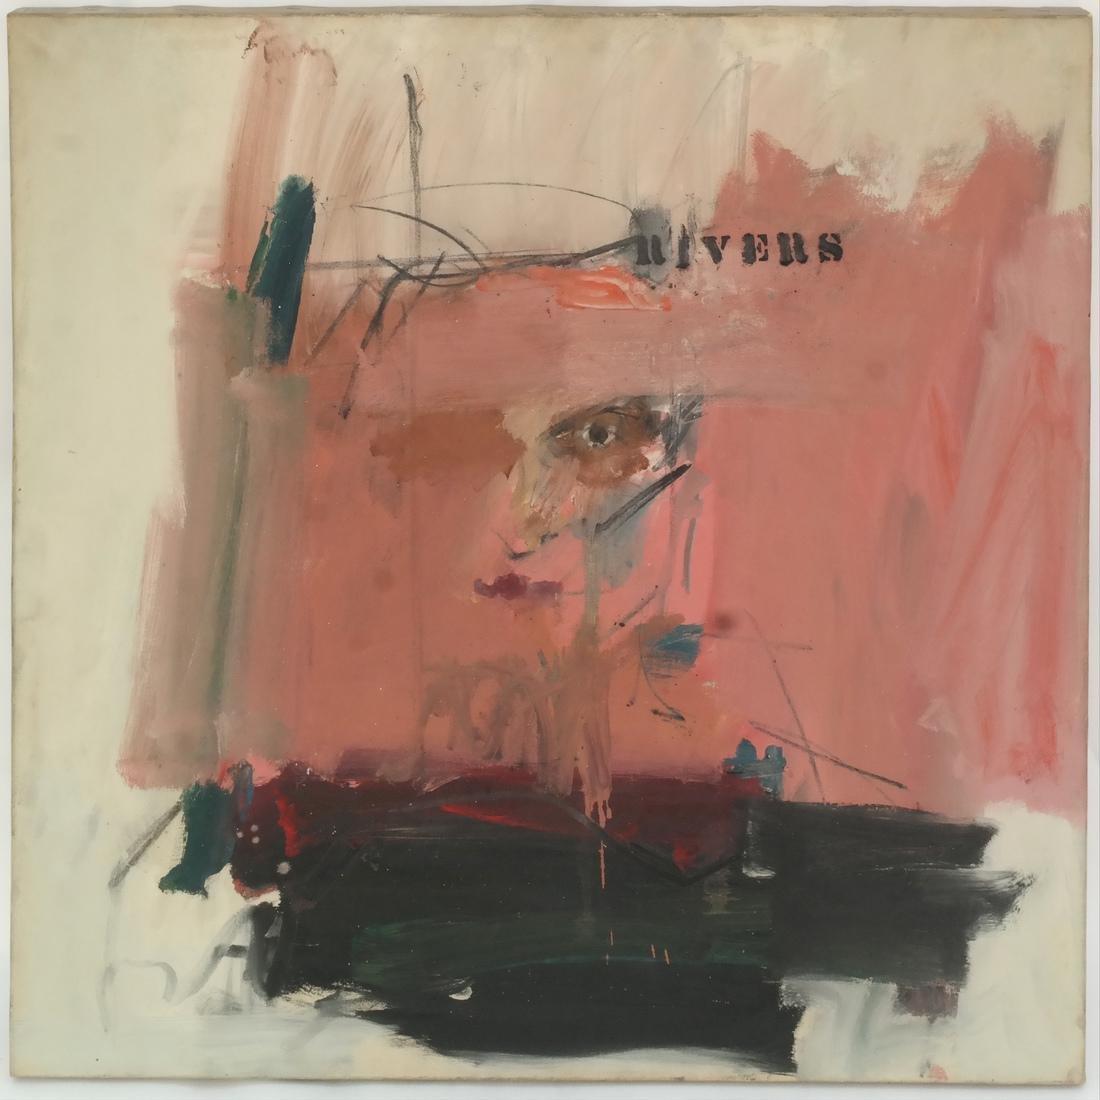 Larry Rivers, Self Portrait - 2